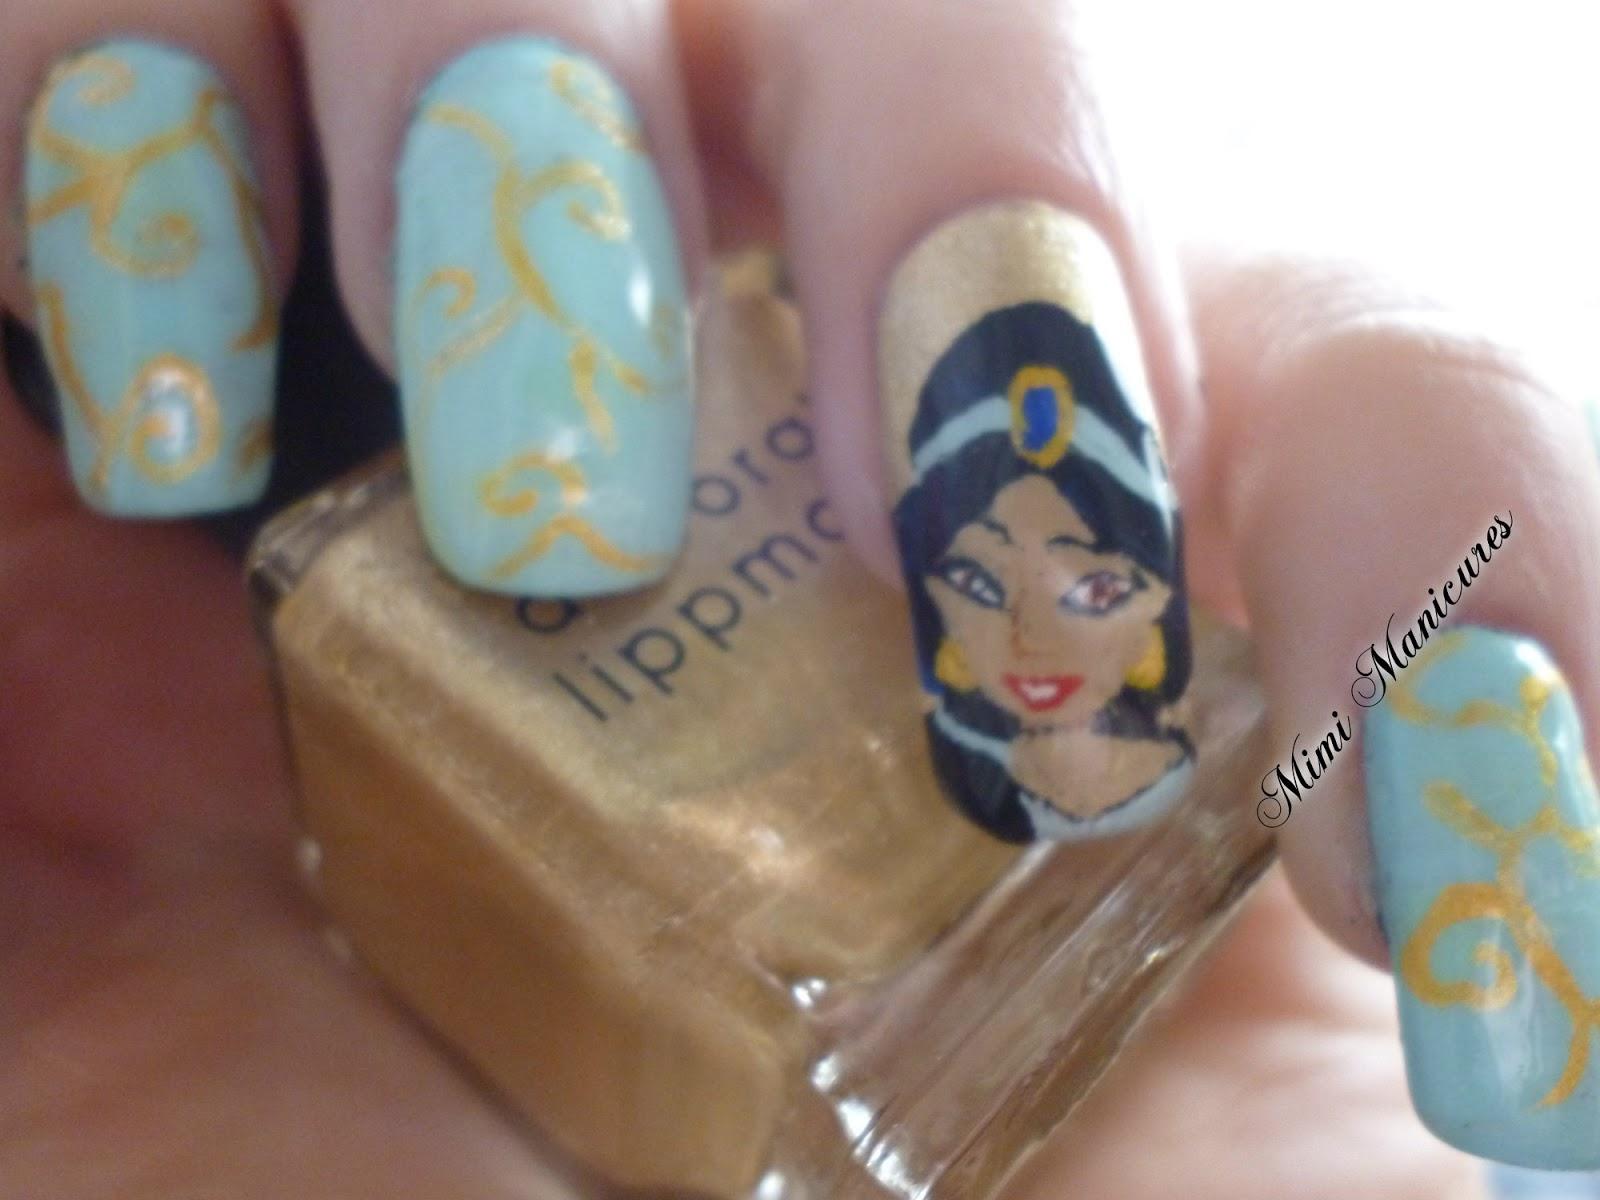 my adventures in nail polish: YAY DISNEY Princesses! Jasmine nail art!